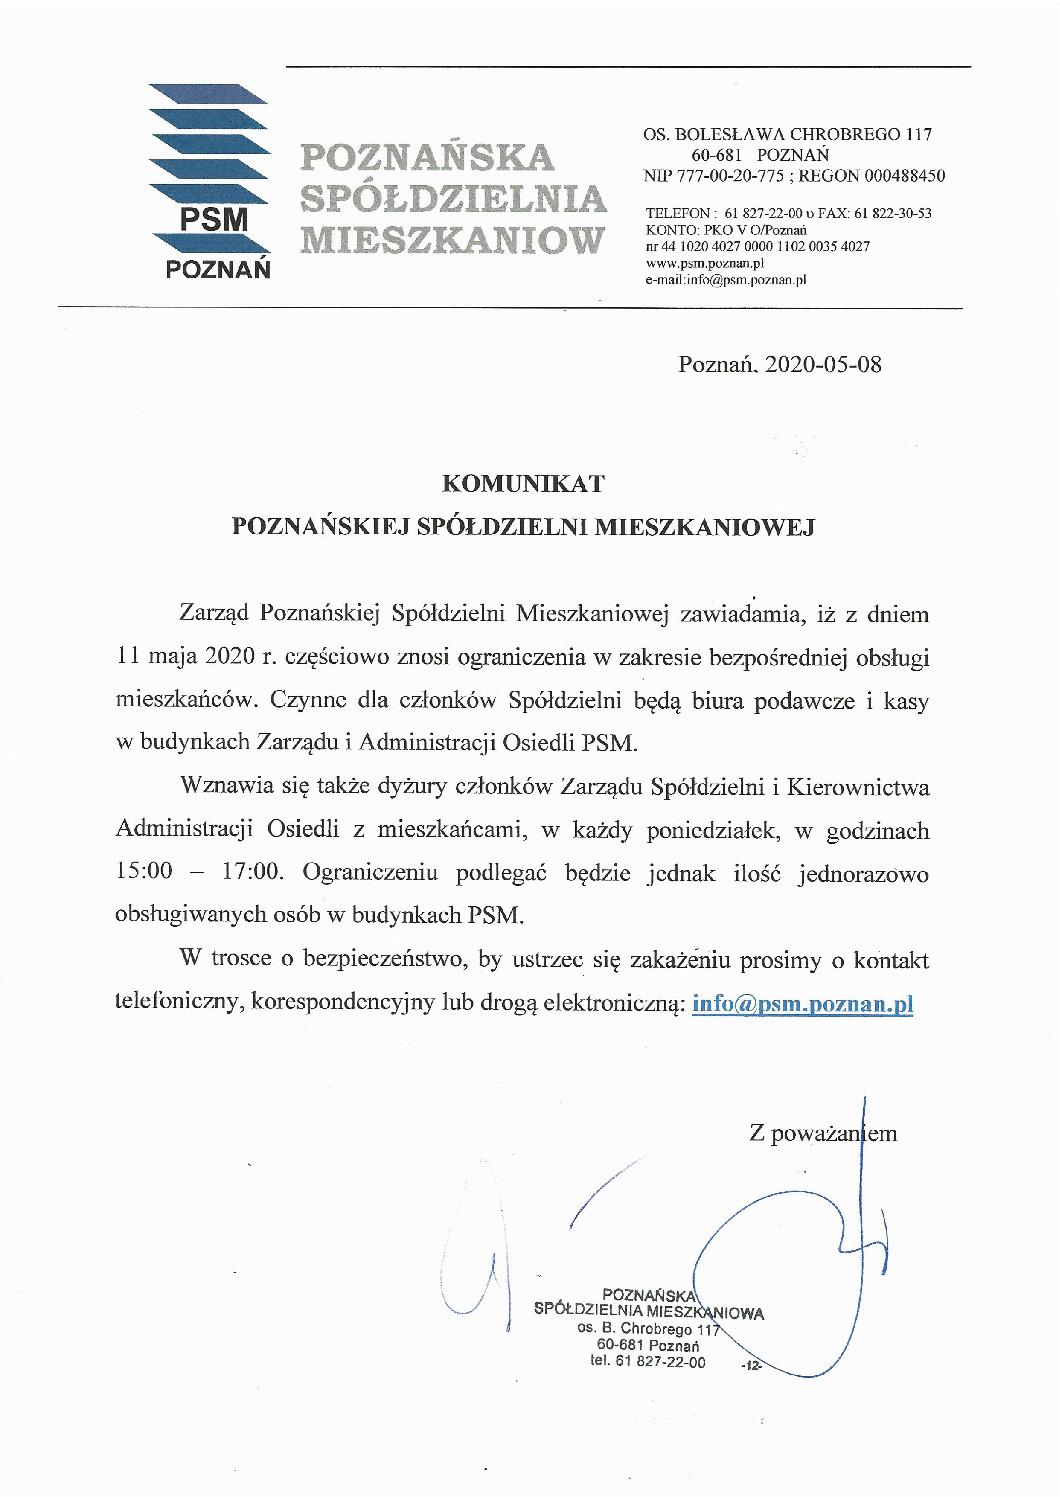 thumbnail of Komunikat z 08.05.2020